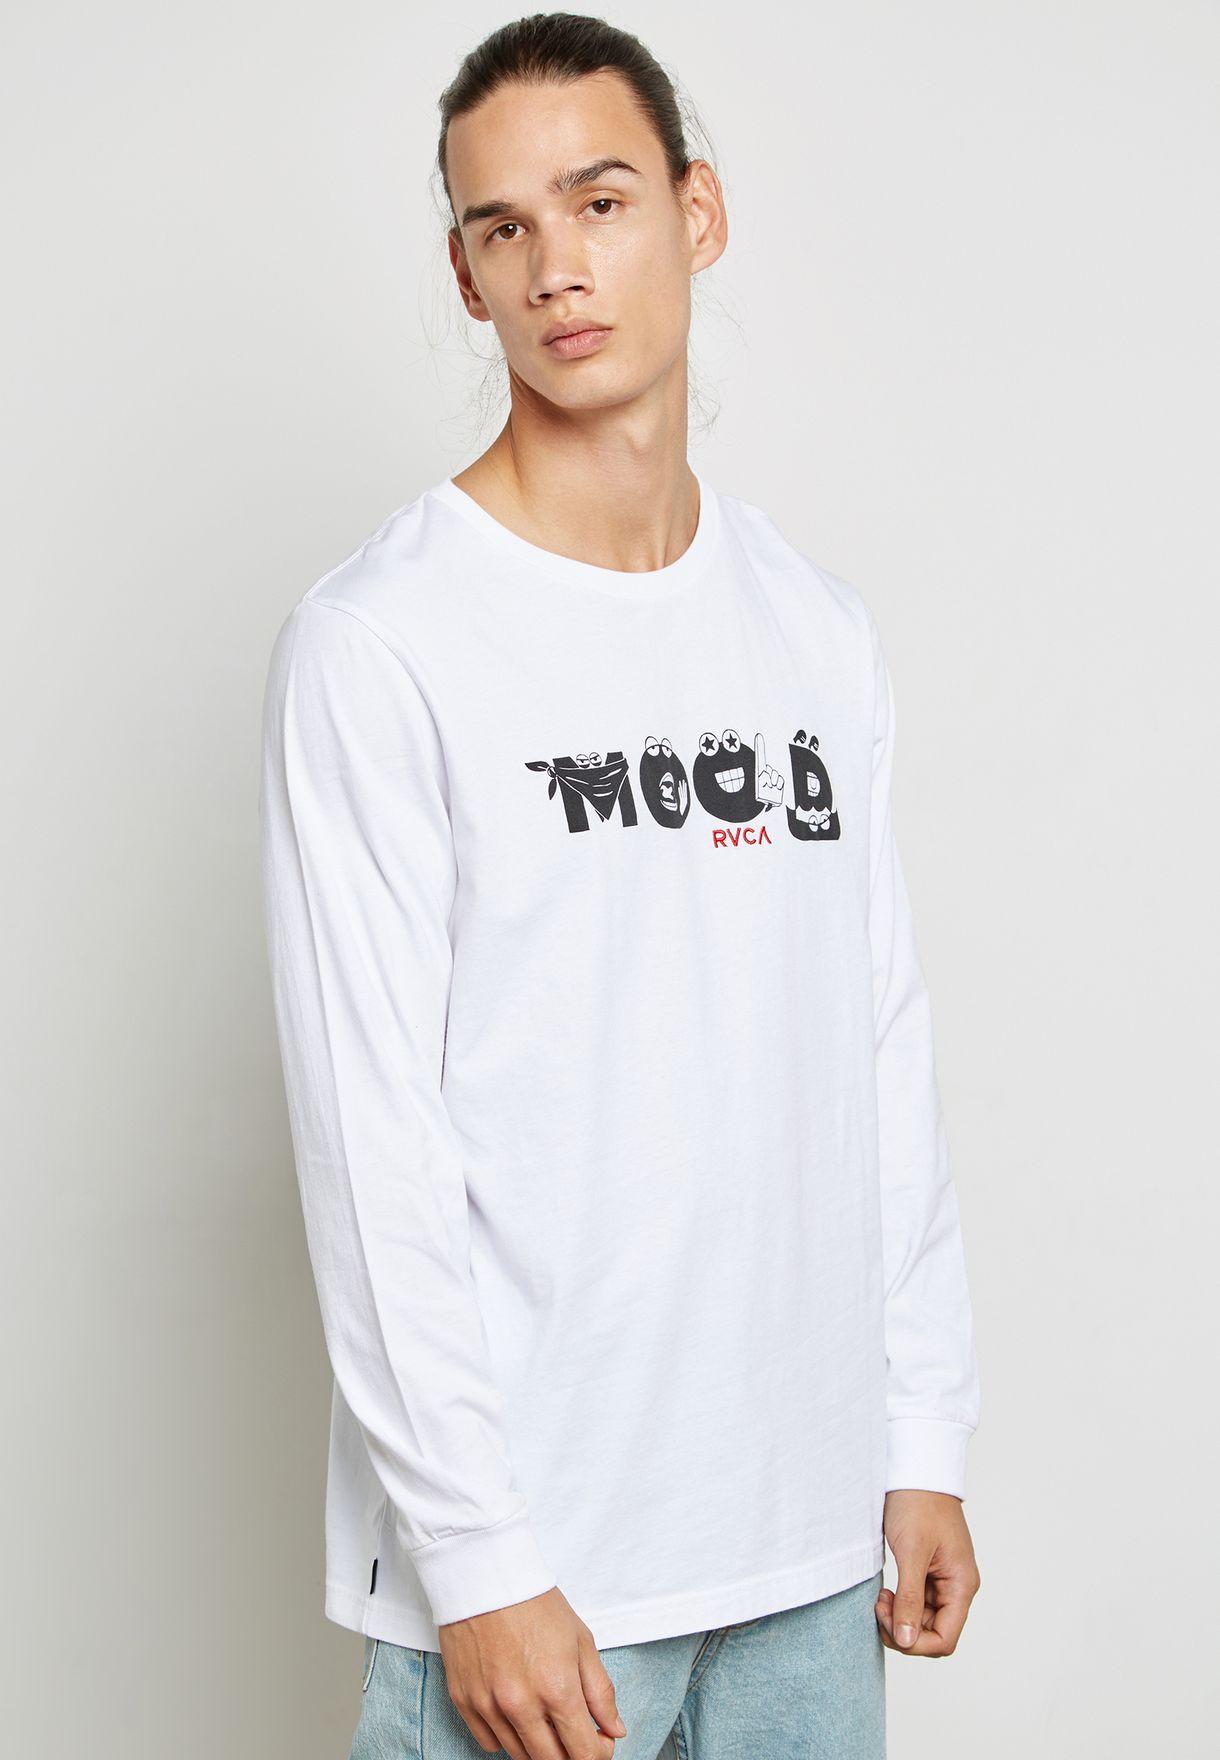 b70c6840c Shop RVCA white Mood T-Shirt R171101-WHI for Men in Bahrain ...